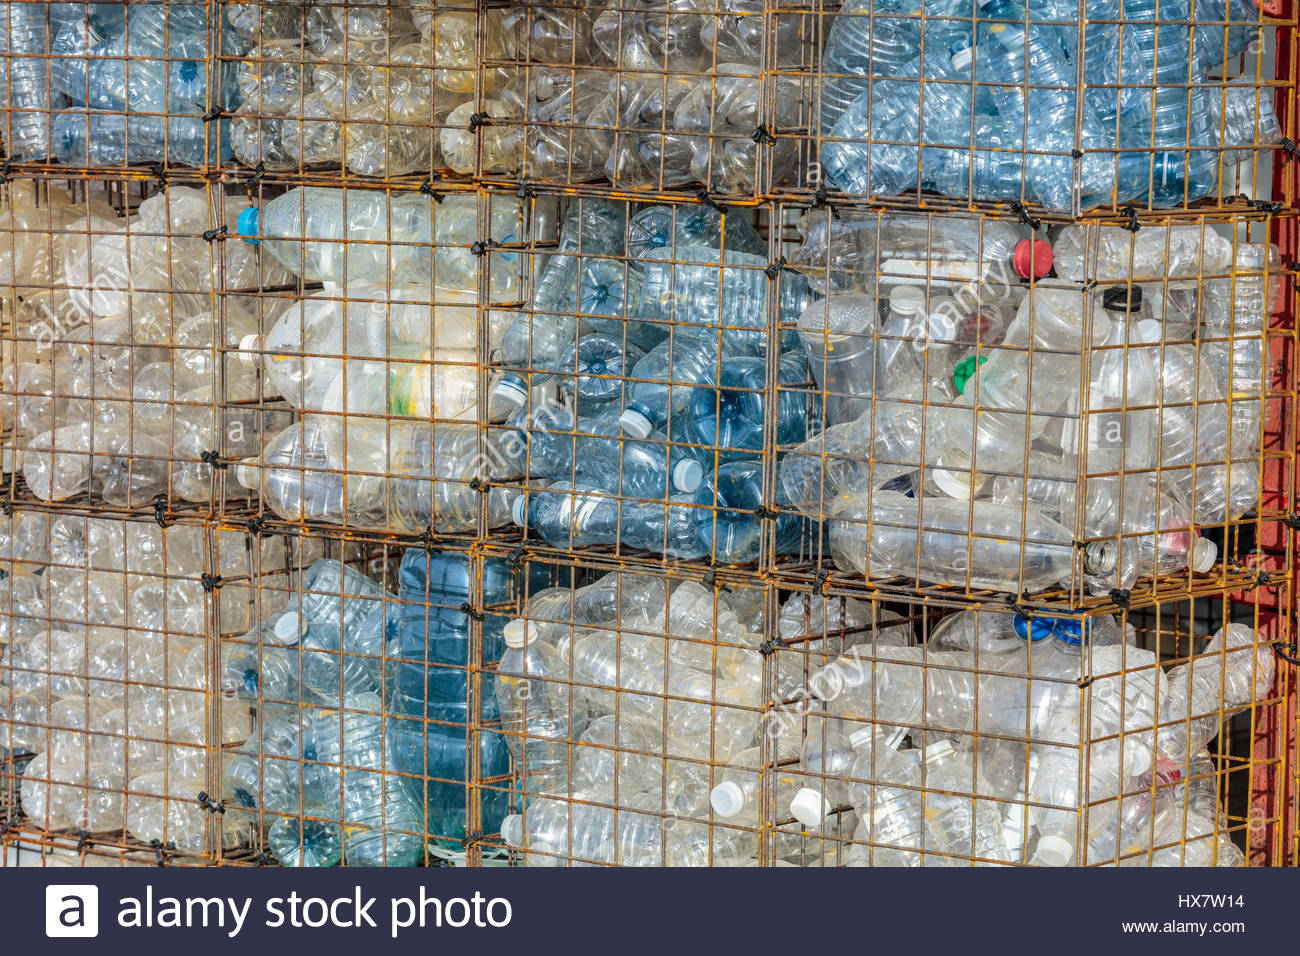 plastic environment plastic bottles discarded plastic bottles garbage trash rubbish litter pollutants waste flotsam - Stock Image